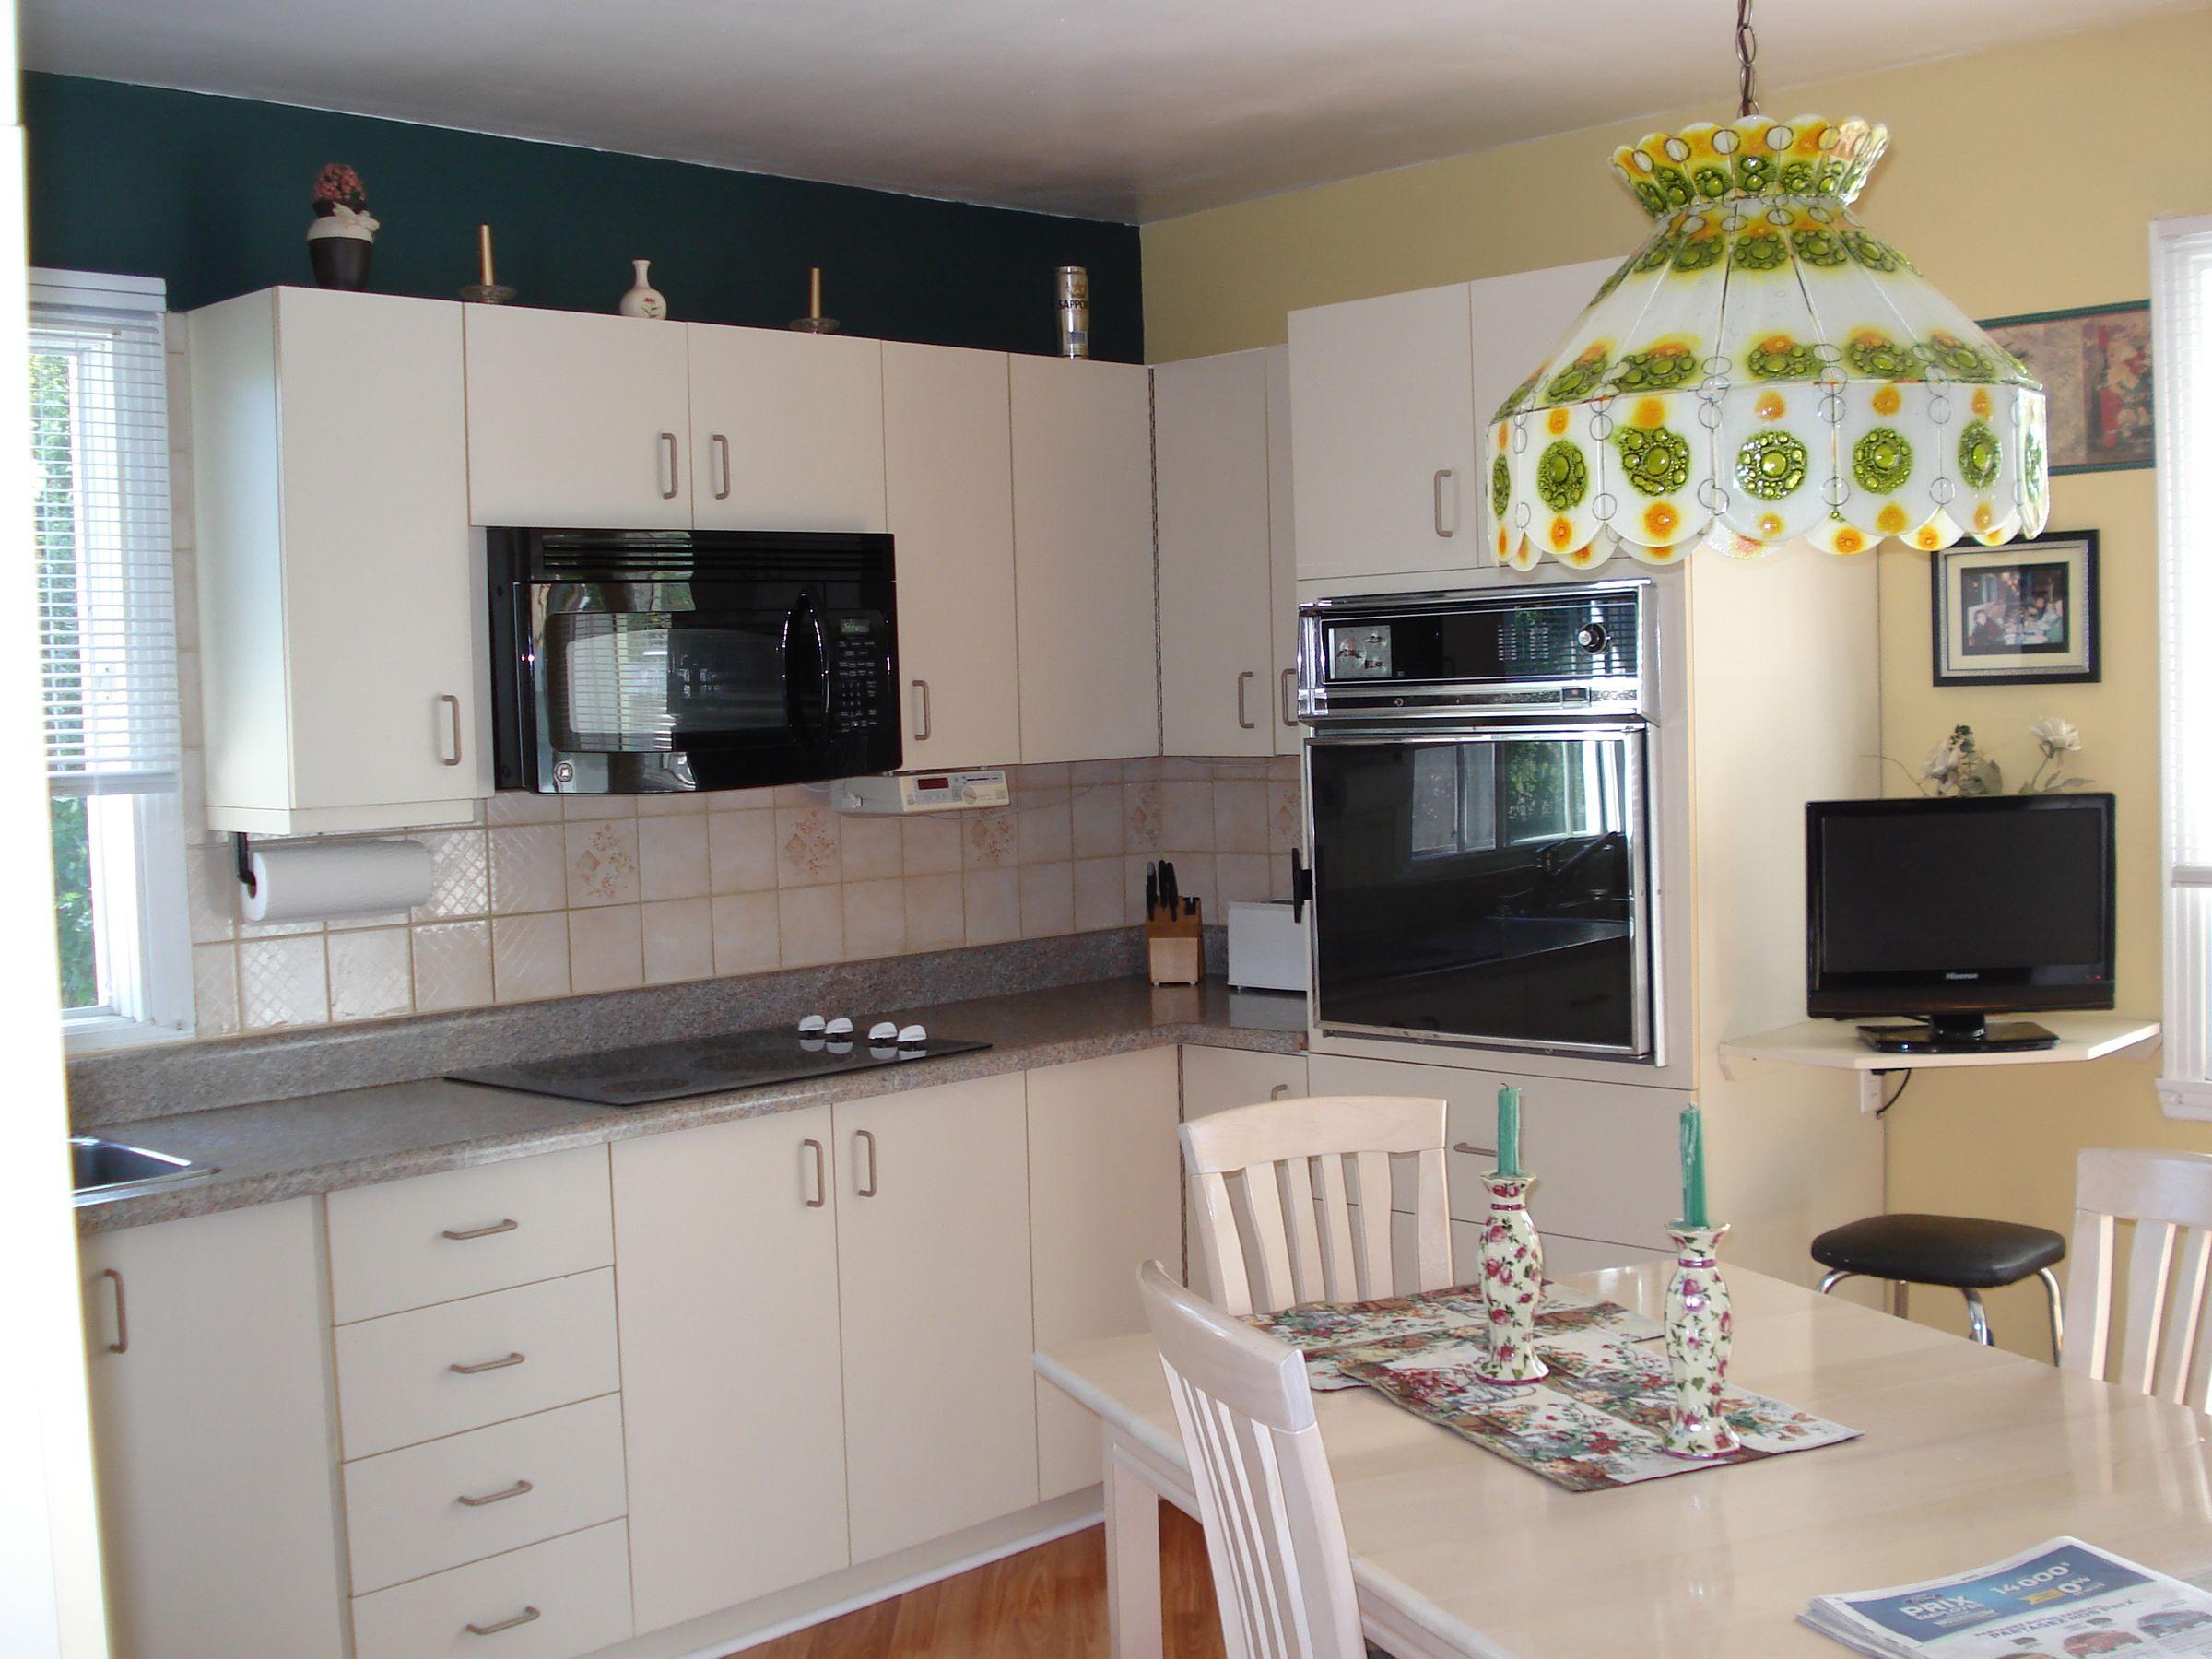 armoire m lamine. Black Bedroom Furniture Sets. Home Design Ideas